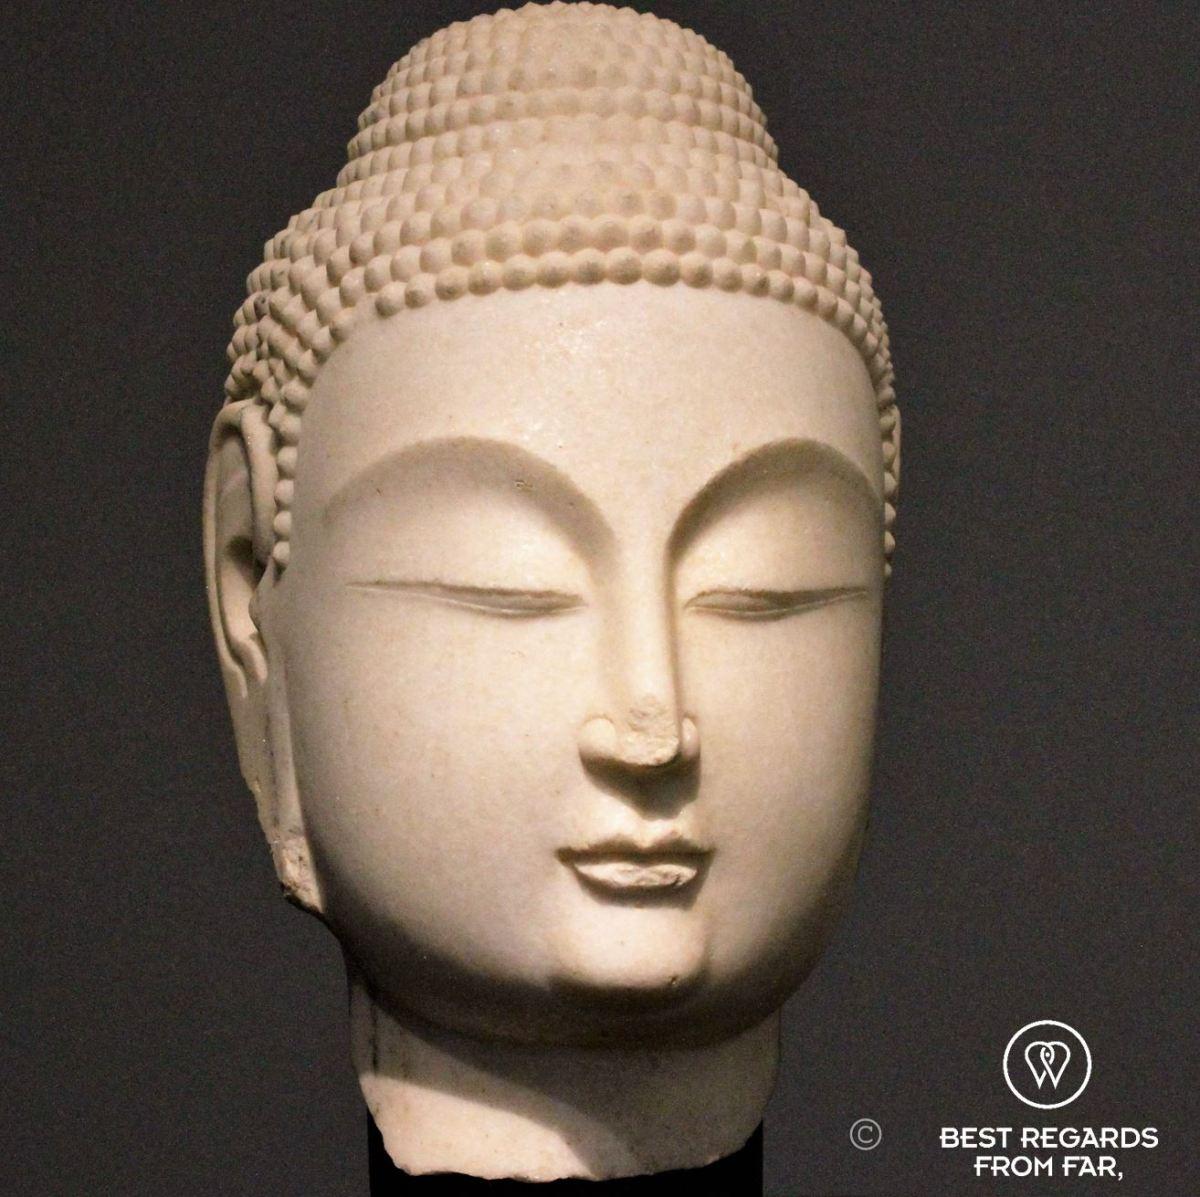 Statue of a white Buddha head, Northern China, 530-580, Louvre Abu Dhabi, UAE.